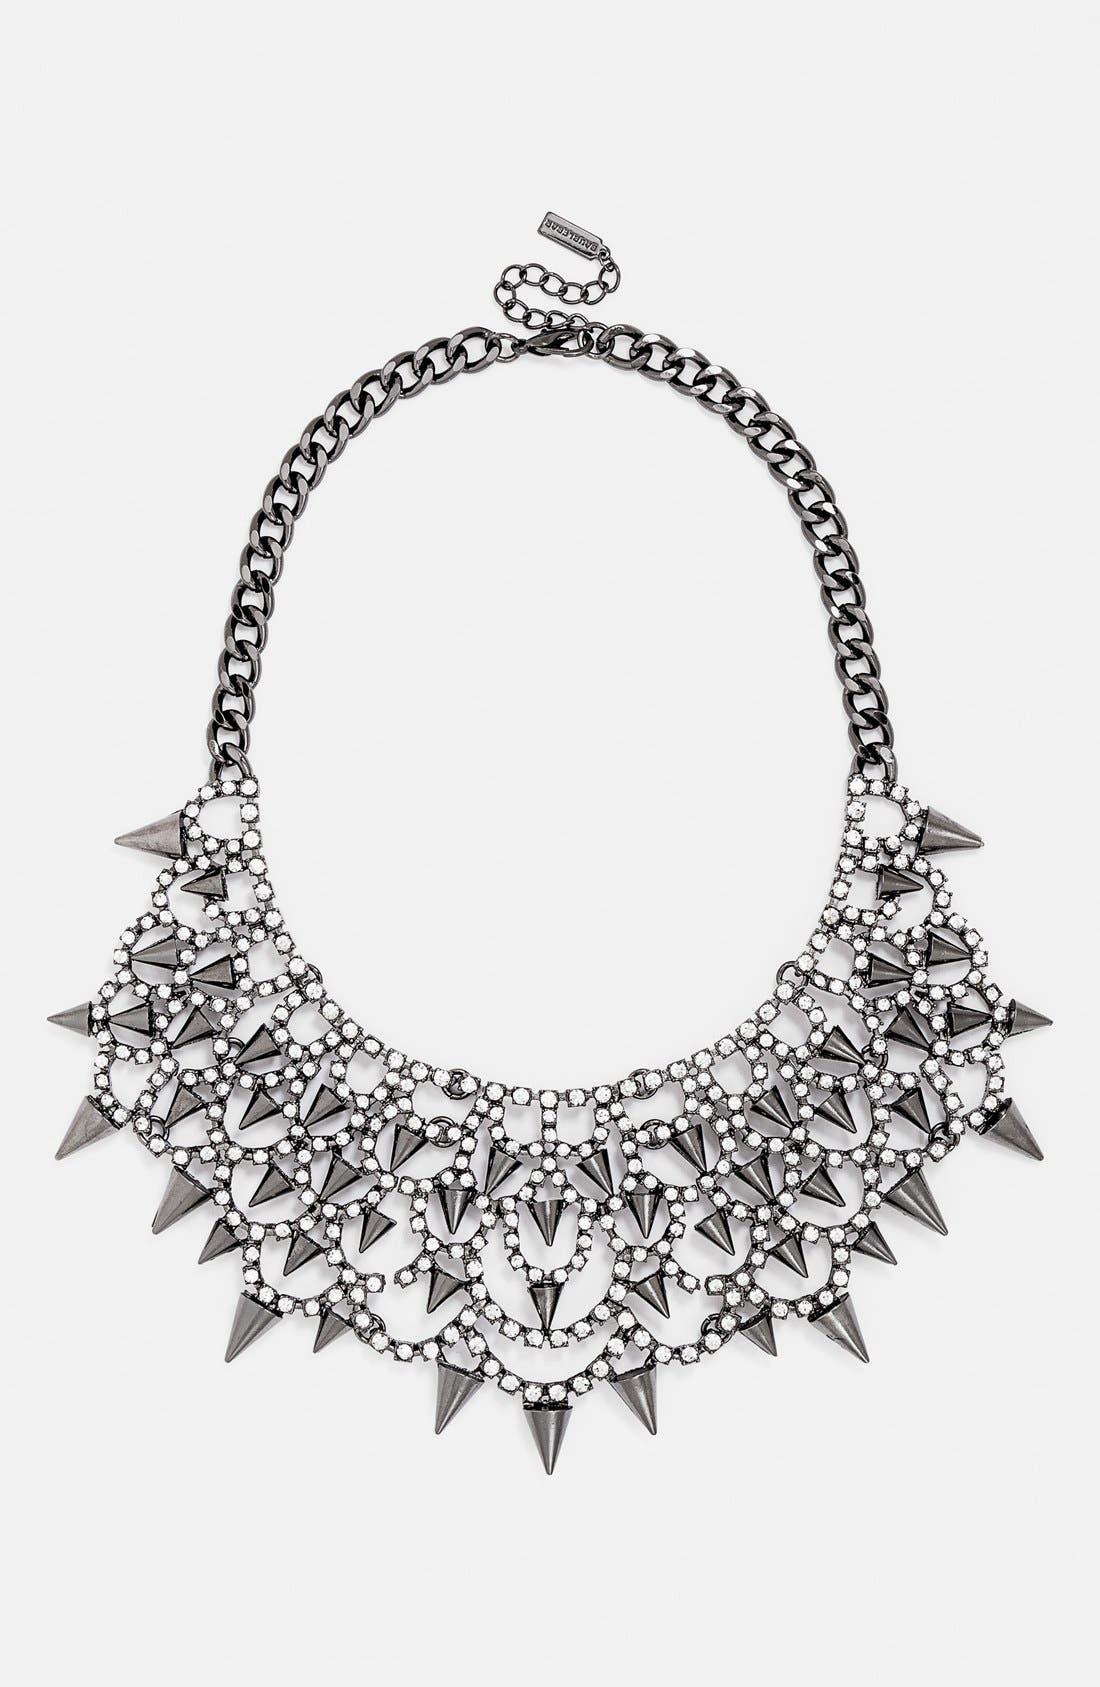 Main Image - BaubleBar 'Gothic Fang' Bib Necklace